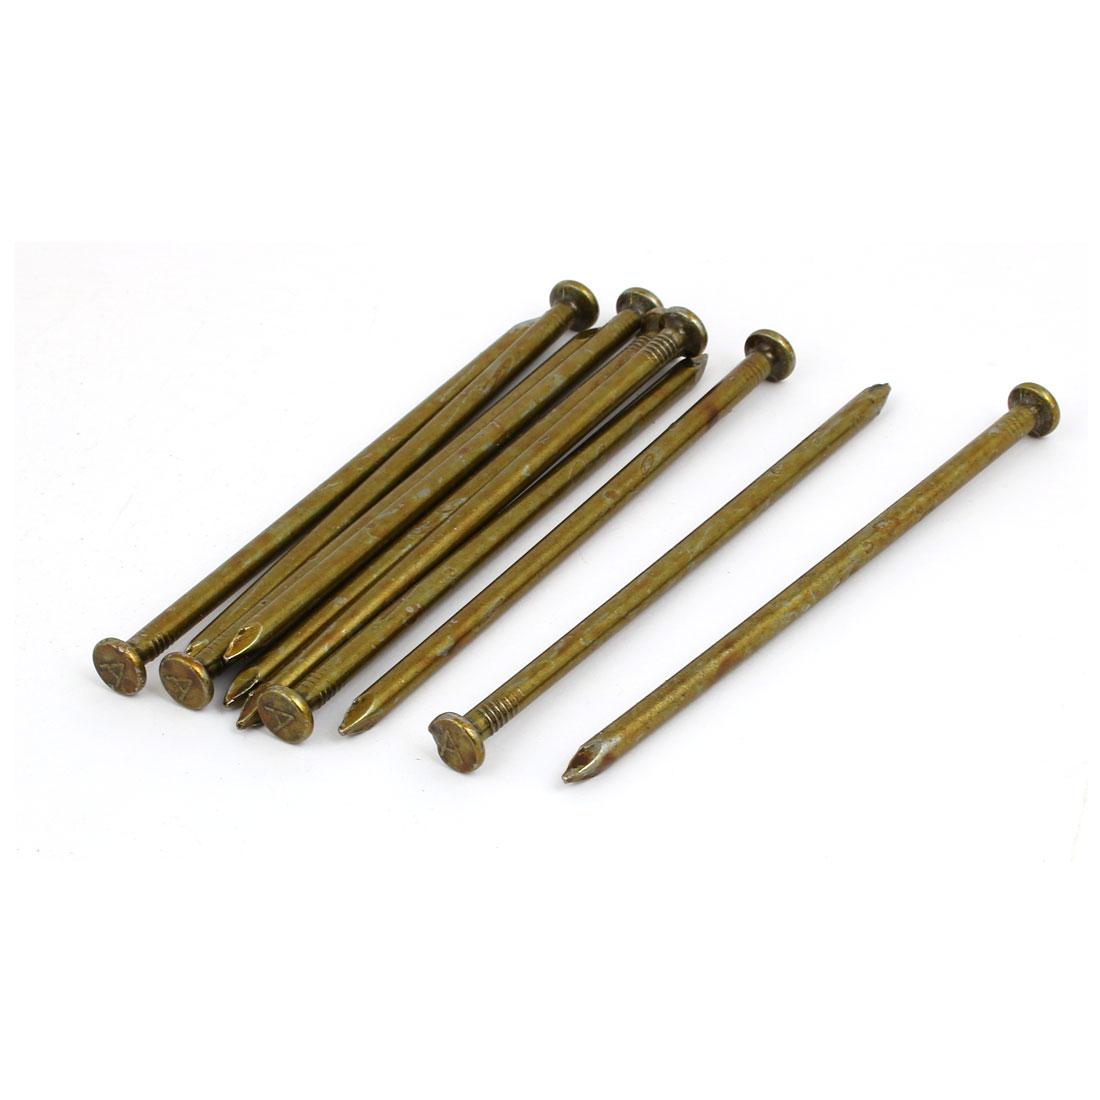 Fiber Concrete Cement Wall Carbon Steel Point Tip Wire Nails 5mmx120mm 10PCS